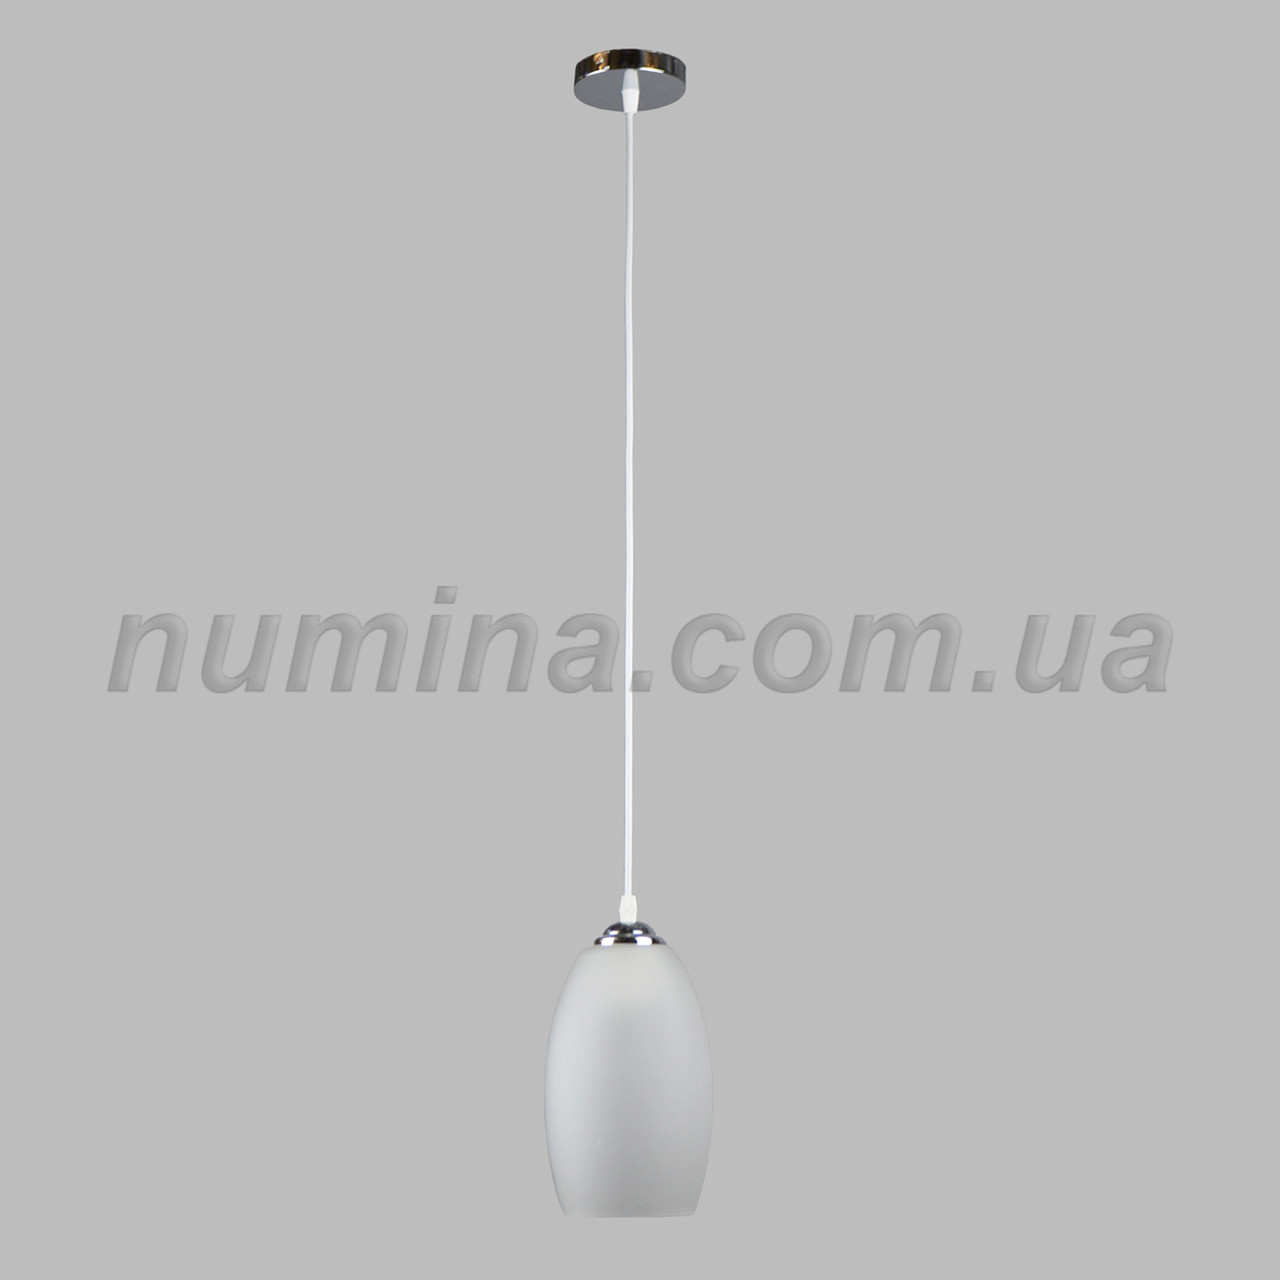 Люстра потолочная на одну лампу 29-X2752-1 CR+WT